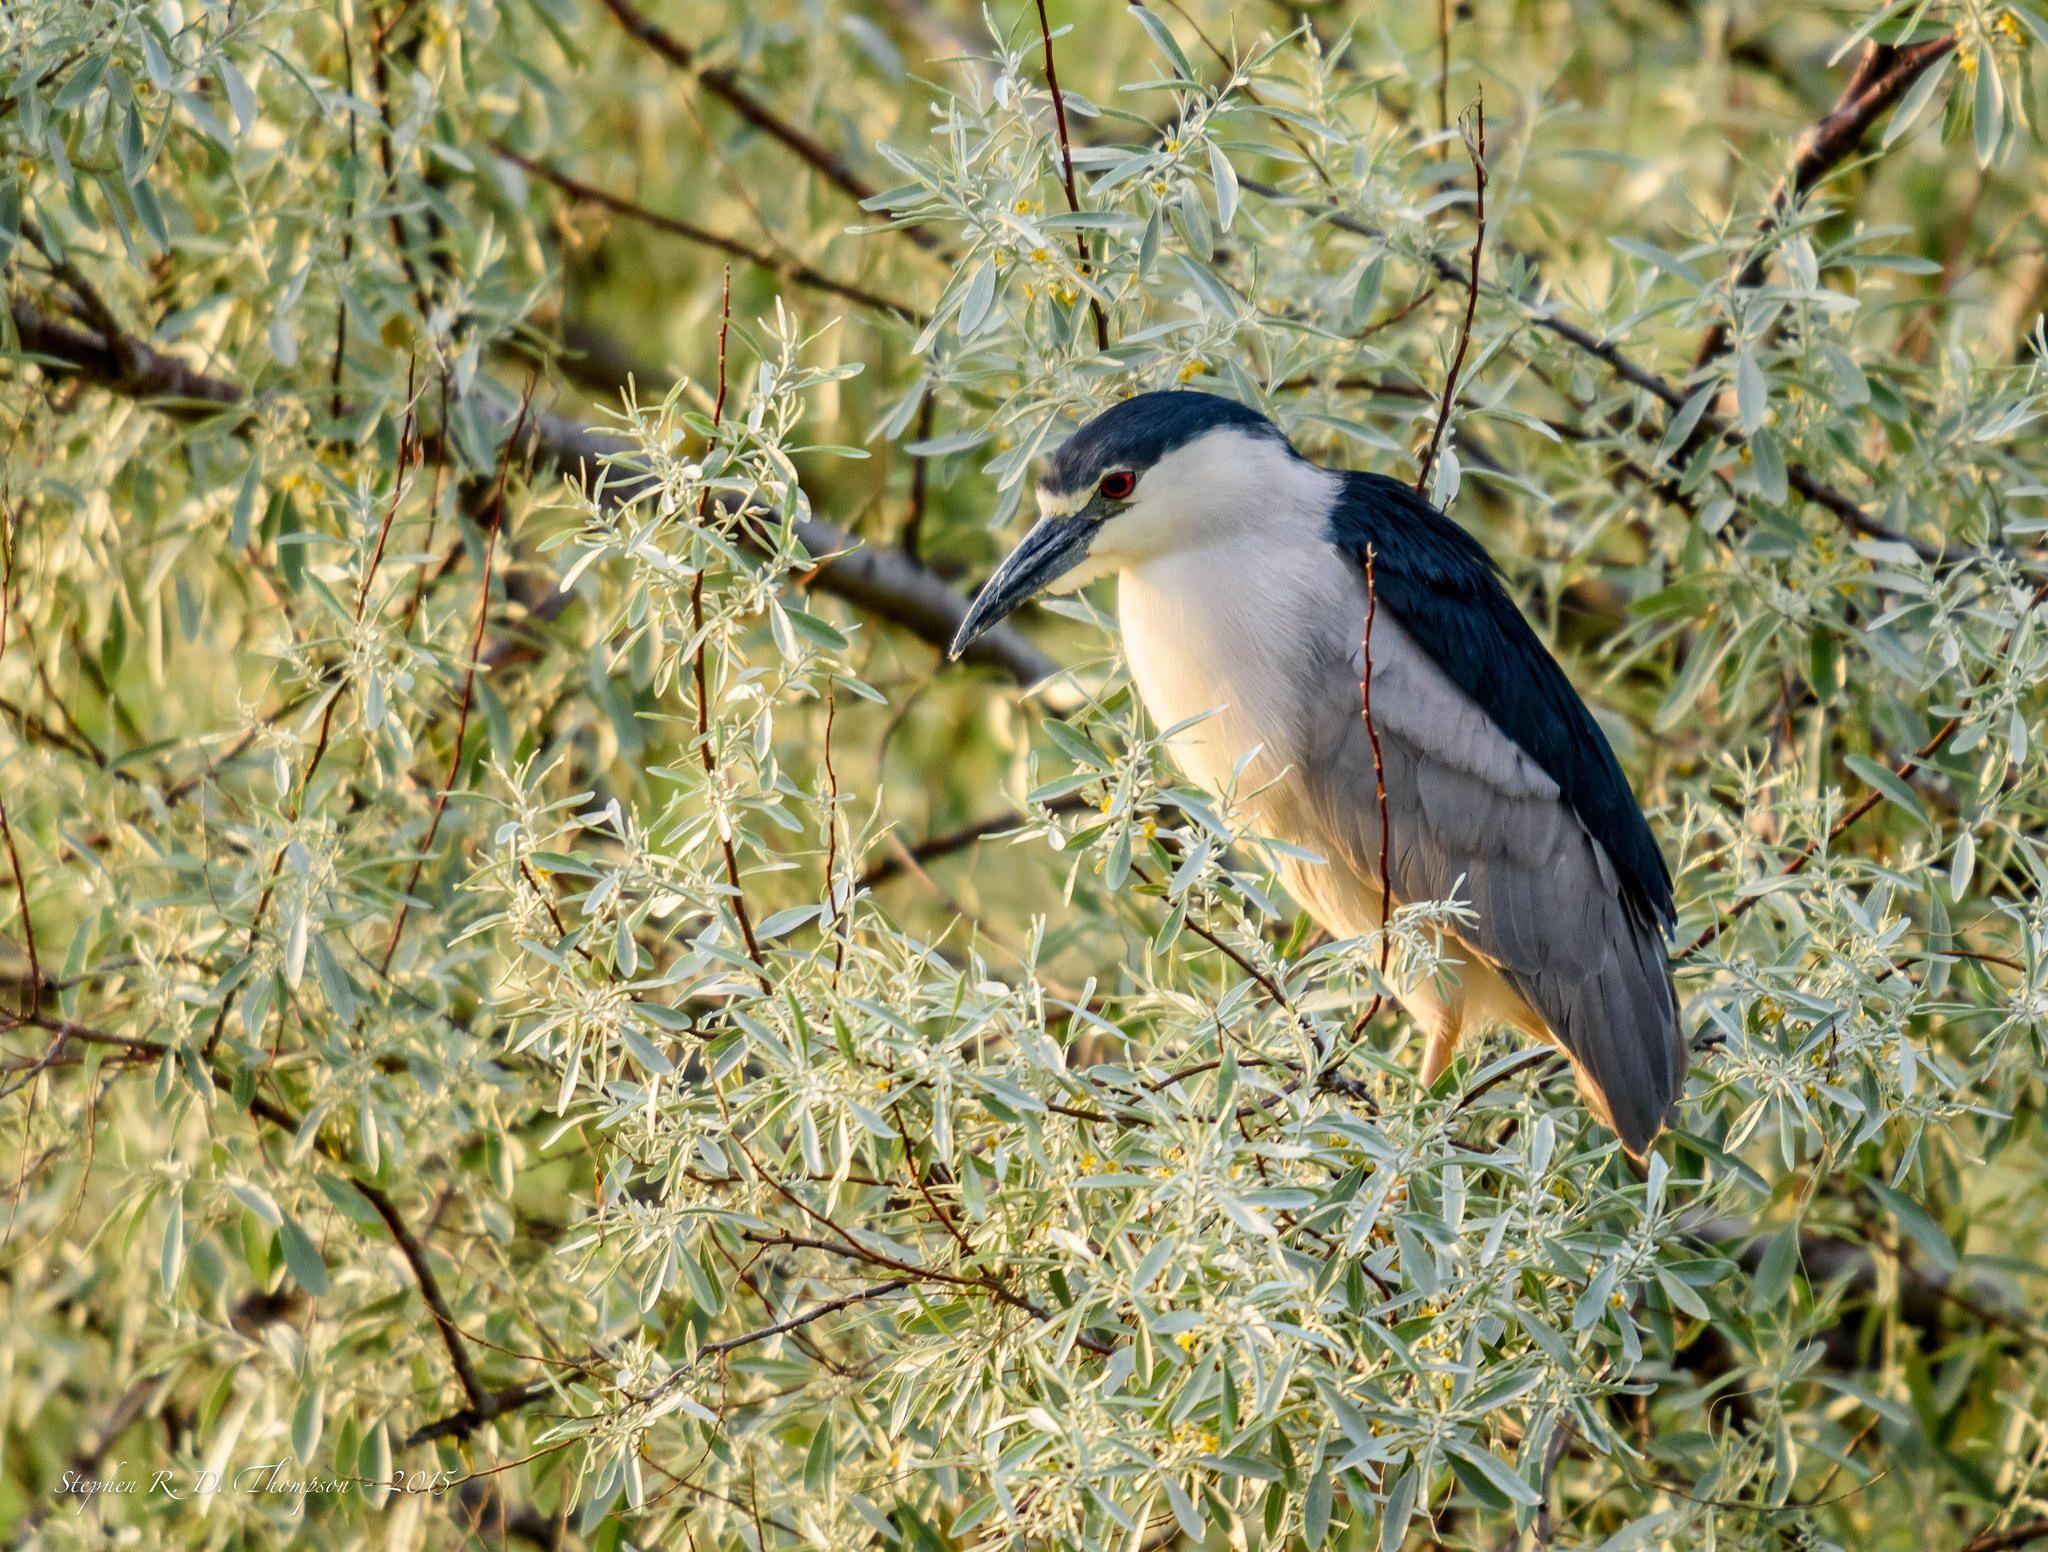 Blackcrowned nightheron heron black night